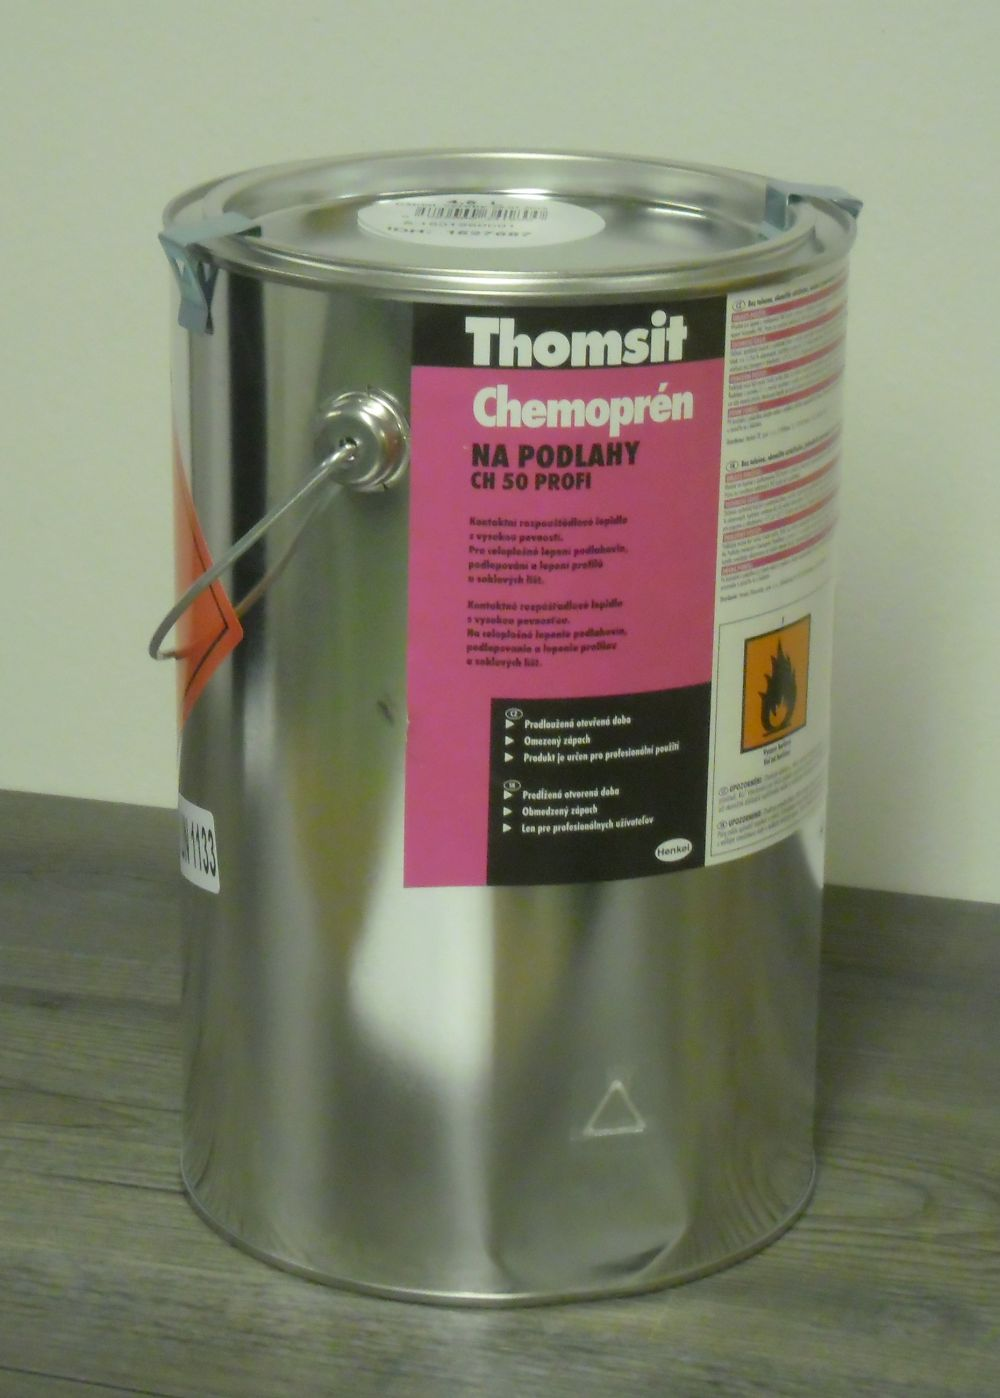 Thomsit Chemoprén na podlahy 4,5l CH 50 profi